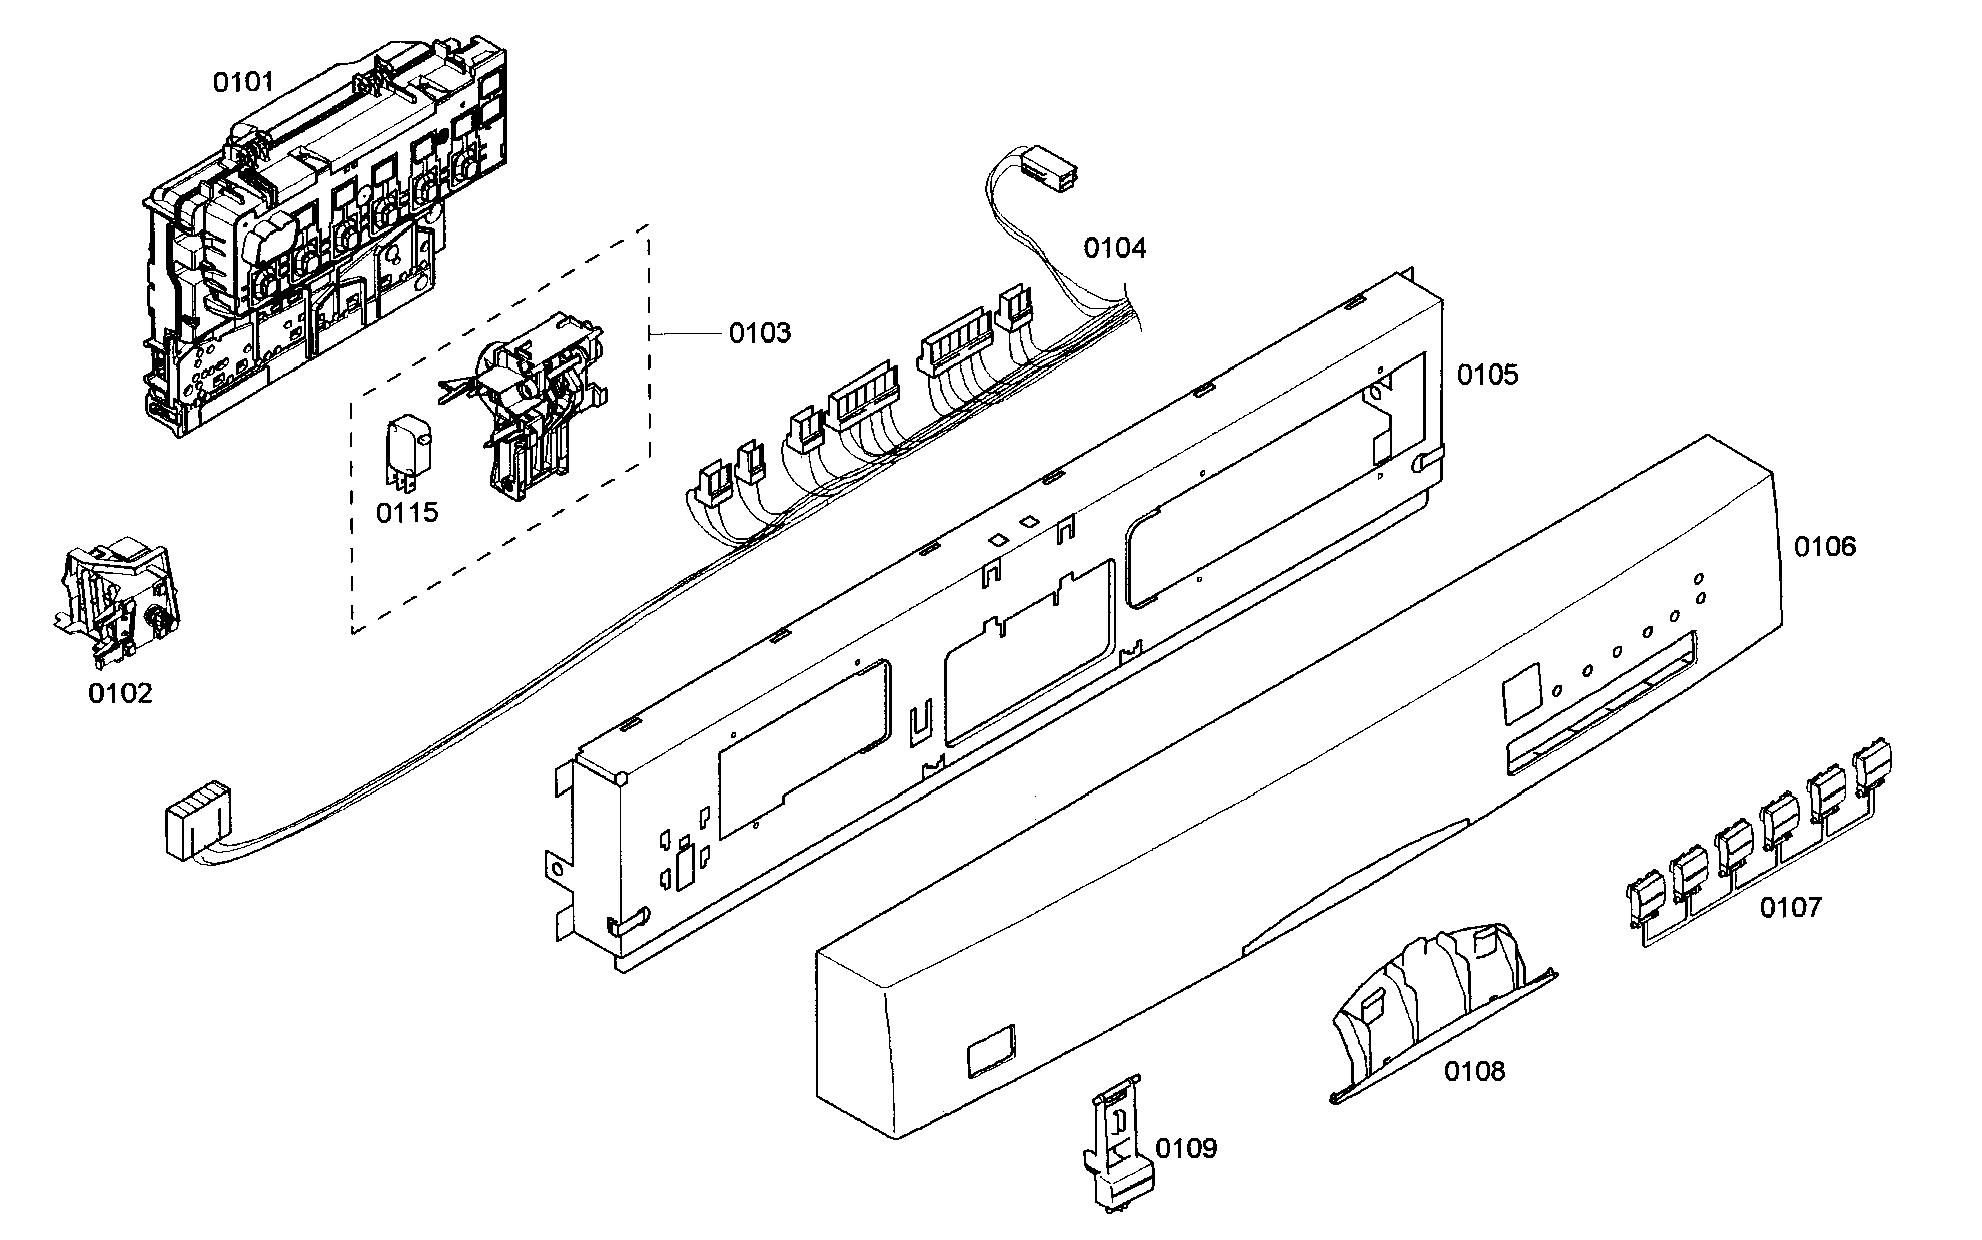 bosch dishwasher parts  bosch dishwasher parts manual